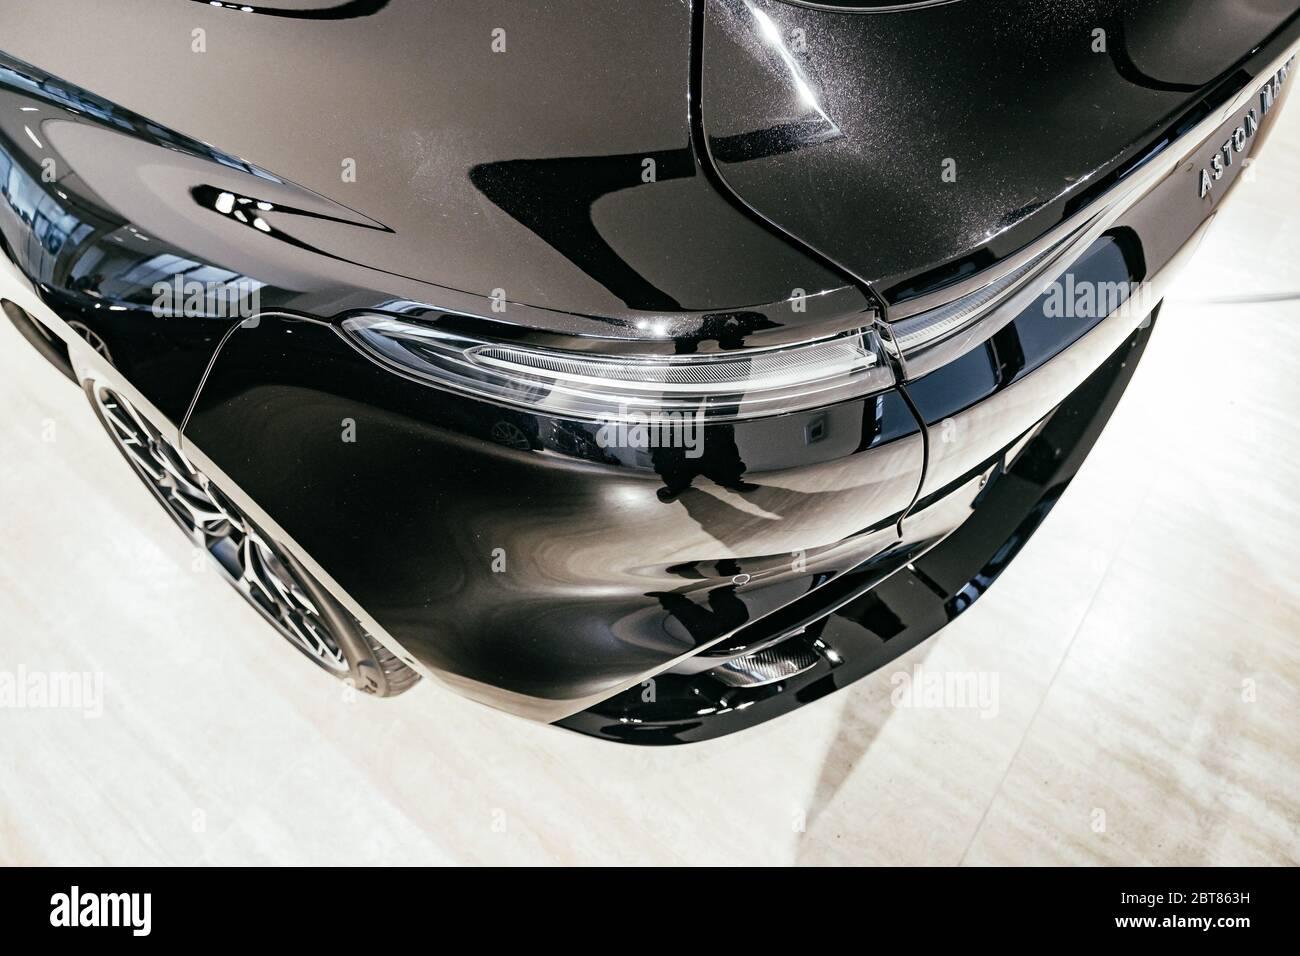 12 14 19 Summit Nj Aston Martin Lauches It S First Suv The Dbx Rear Angle Stock Photo Alamy